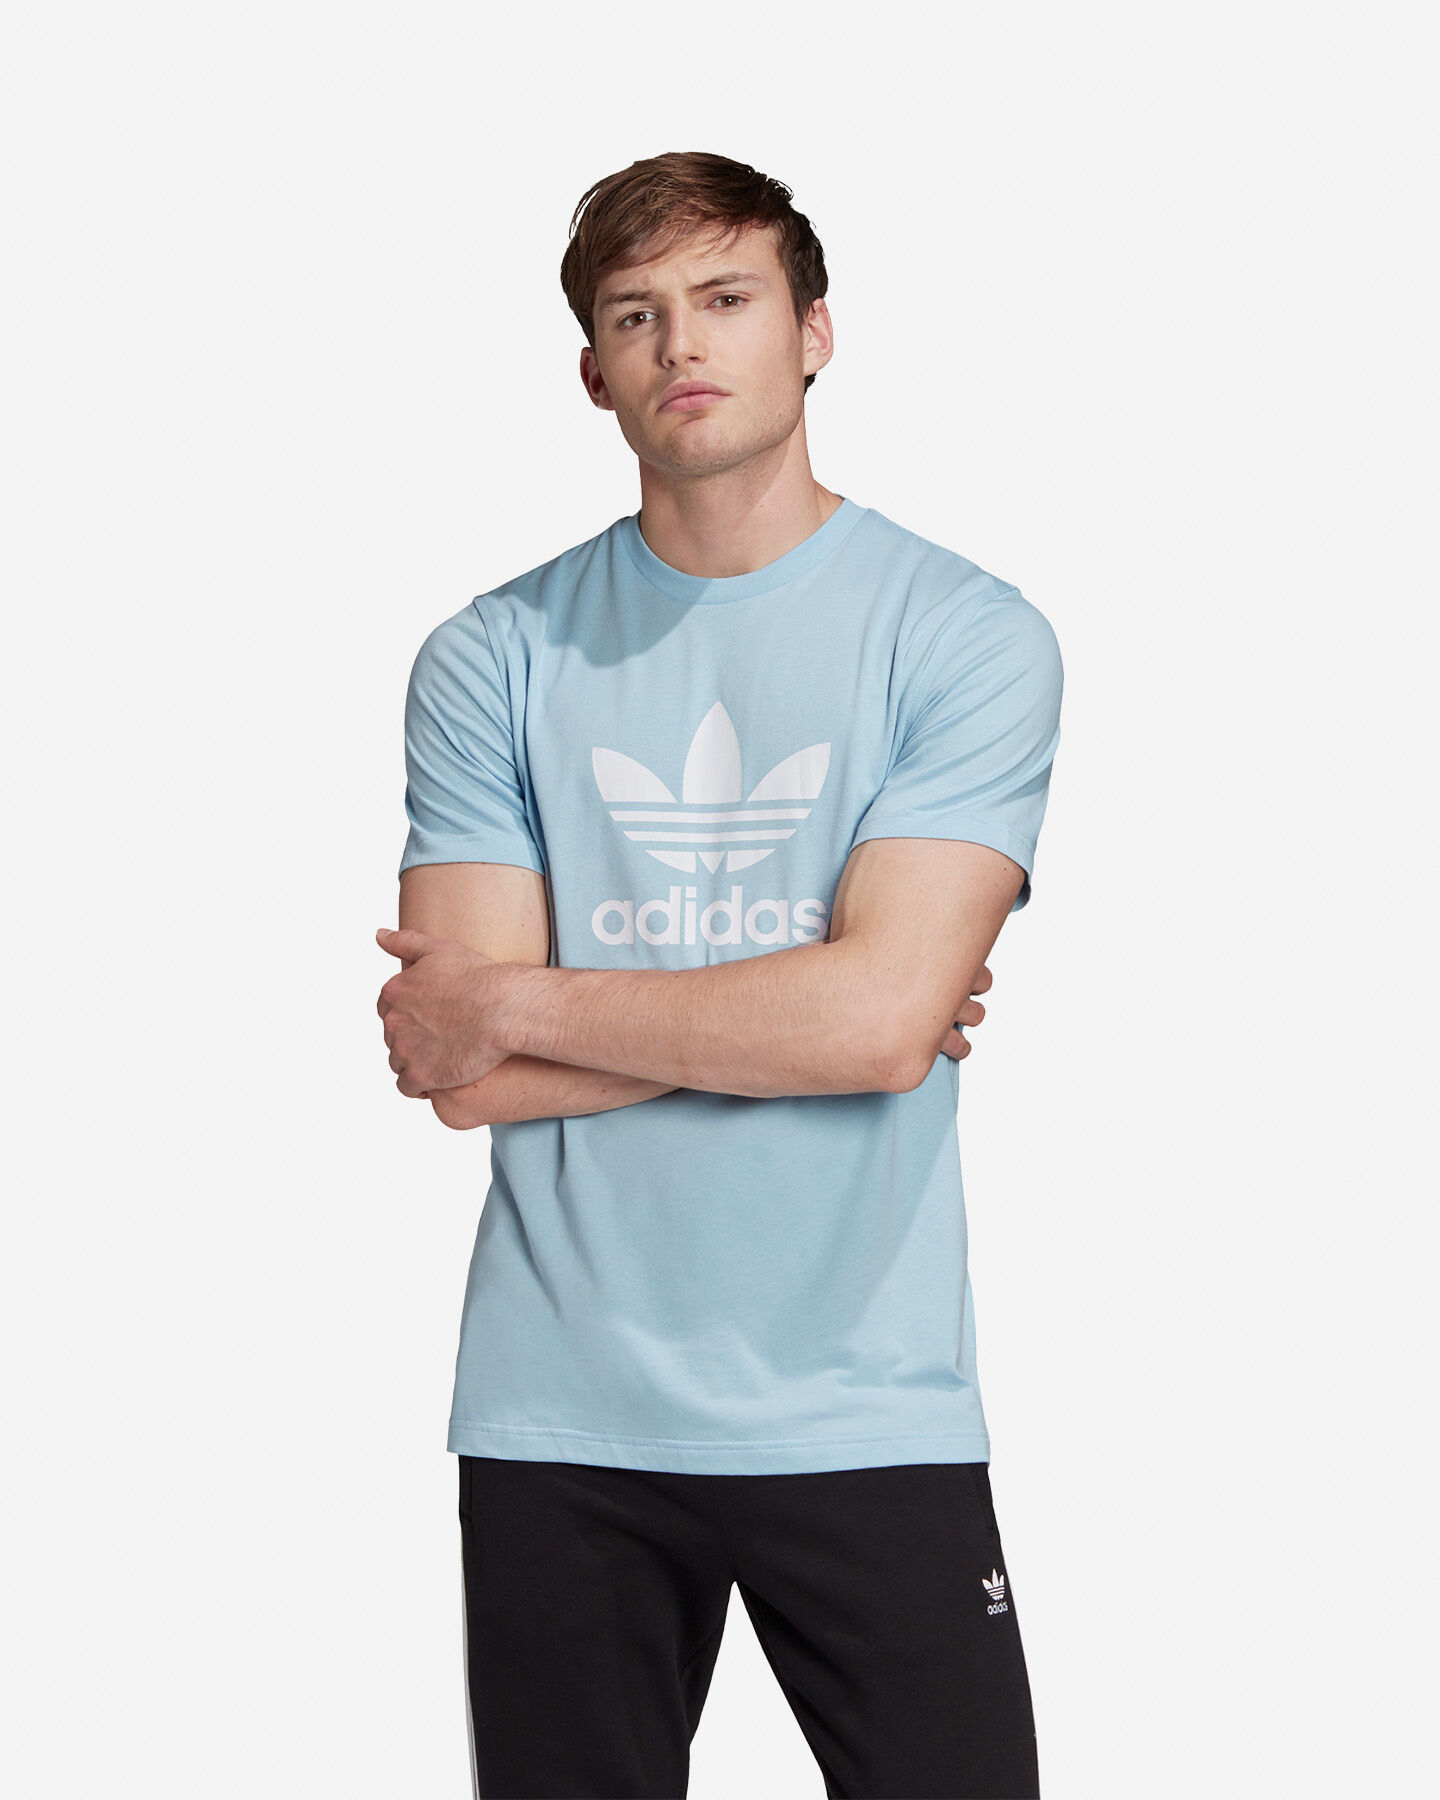 T-Shirt ADIDAS TREFOIL ADICOLOR M S5148483 scatto 2